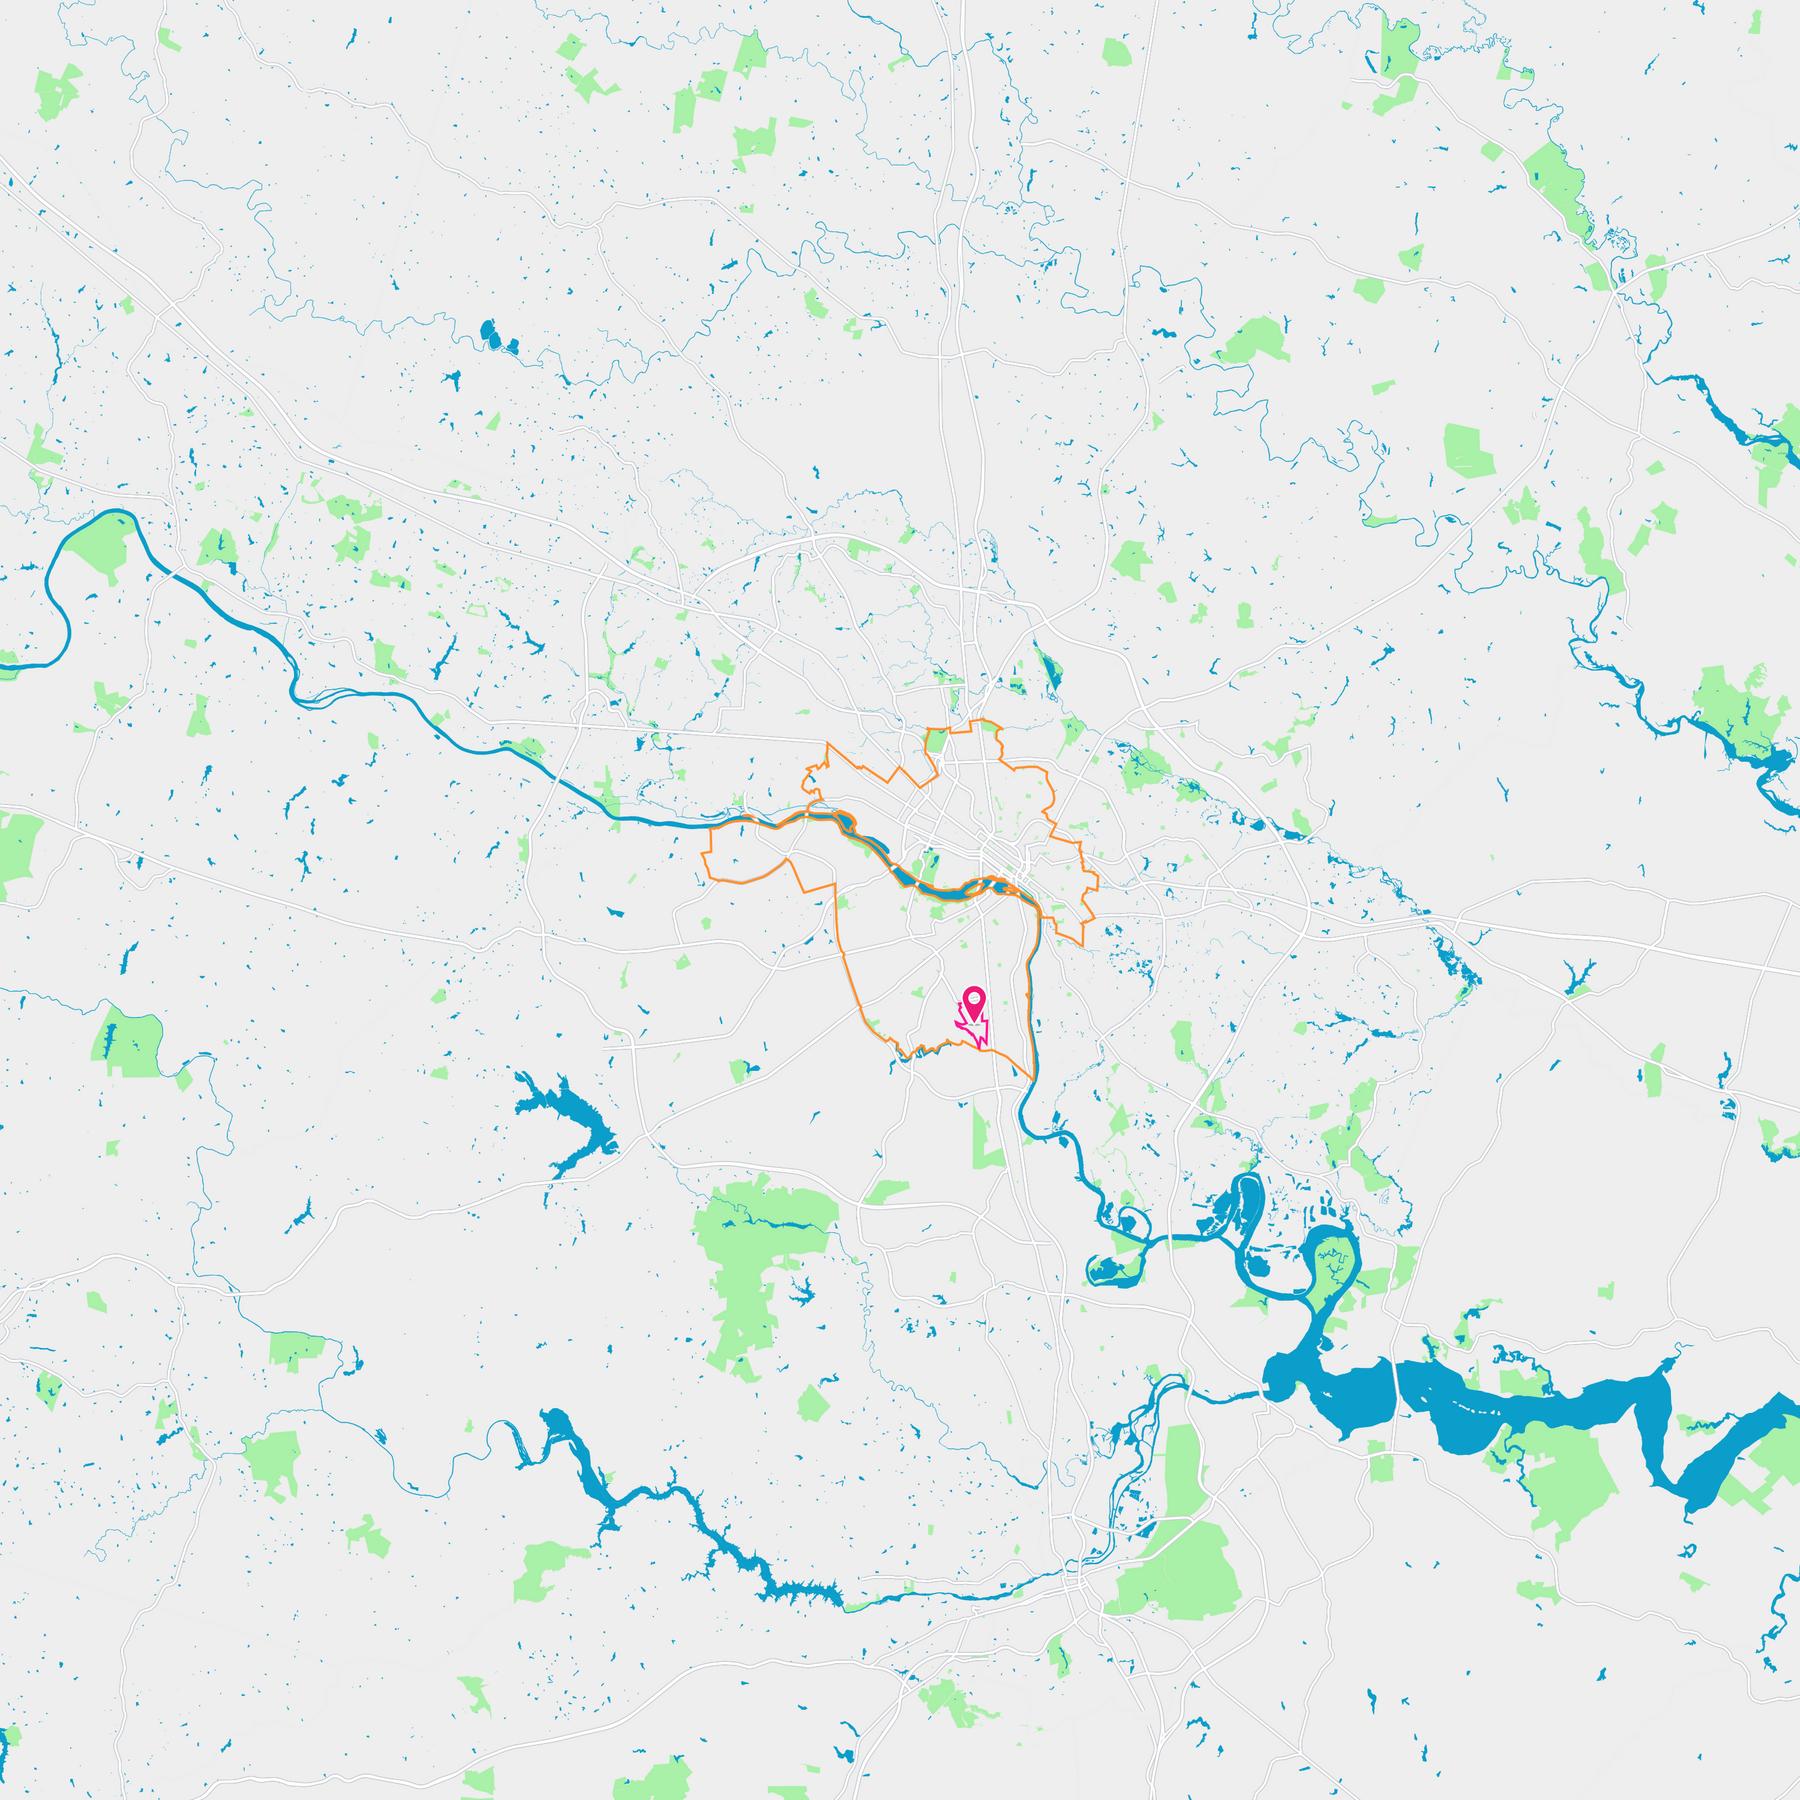 Parnell Industrial Area Neighborhood Guide - Richmond, VA | Trulia on recreational map of va, political map of va, geological map of va, railroad map of va, driving map of va, county map of va, physical map of va, municipal map of va, topographical map of va,